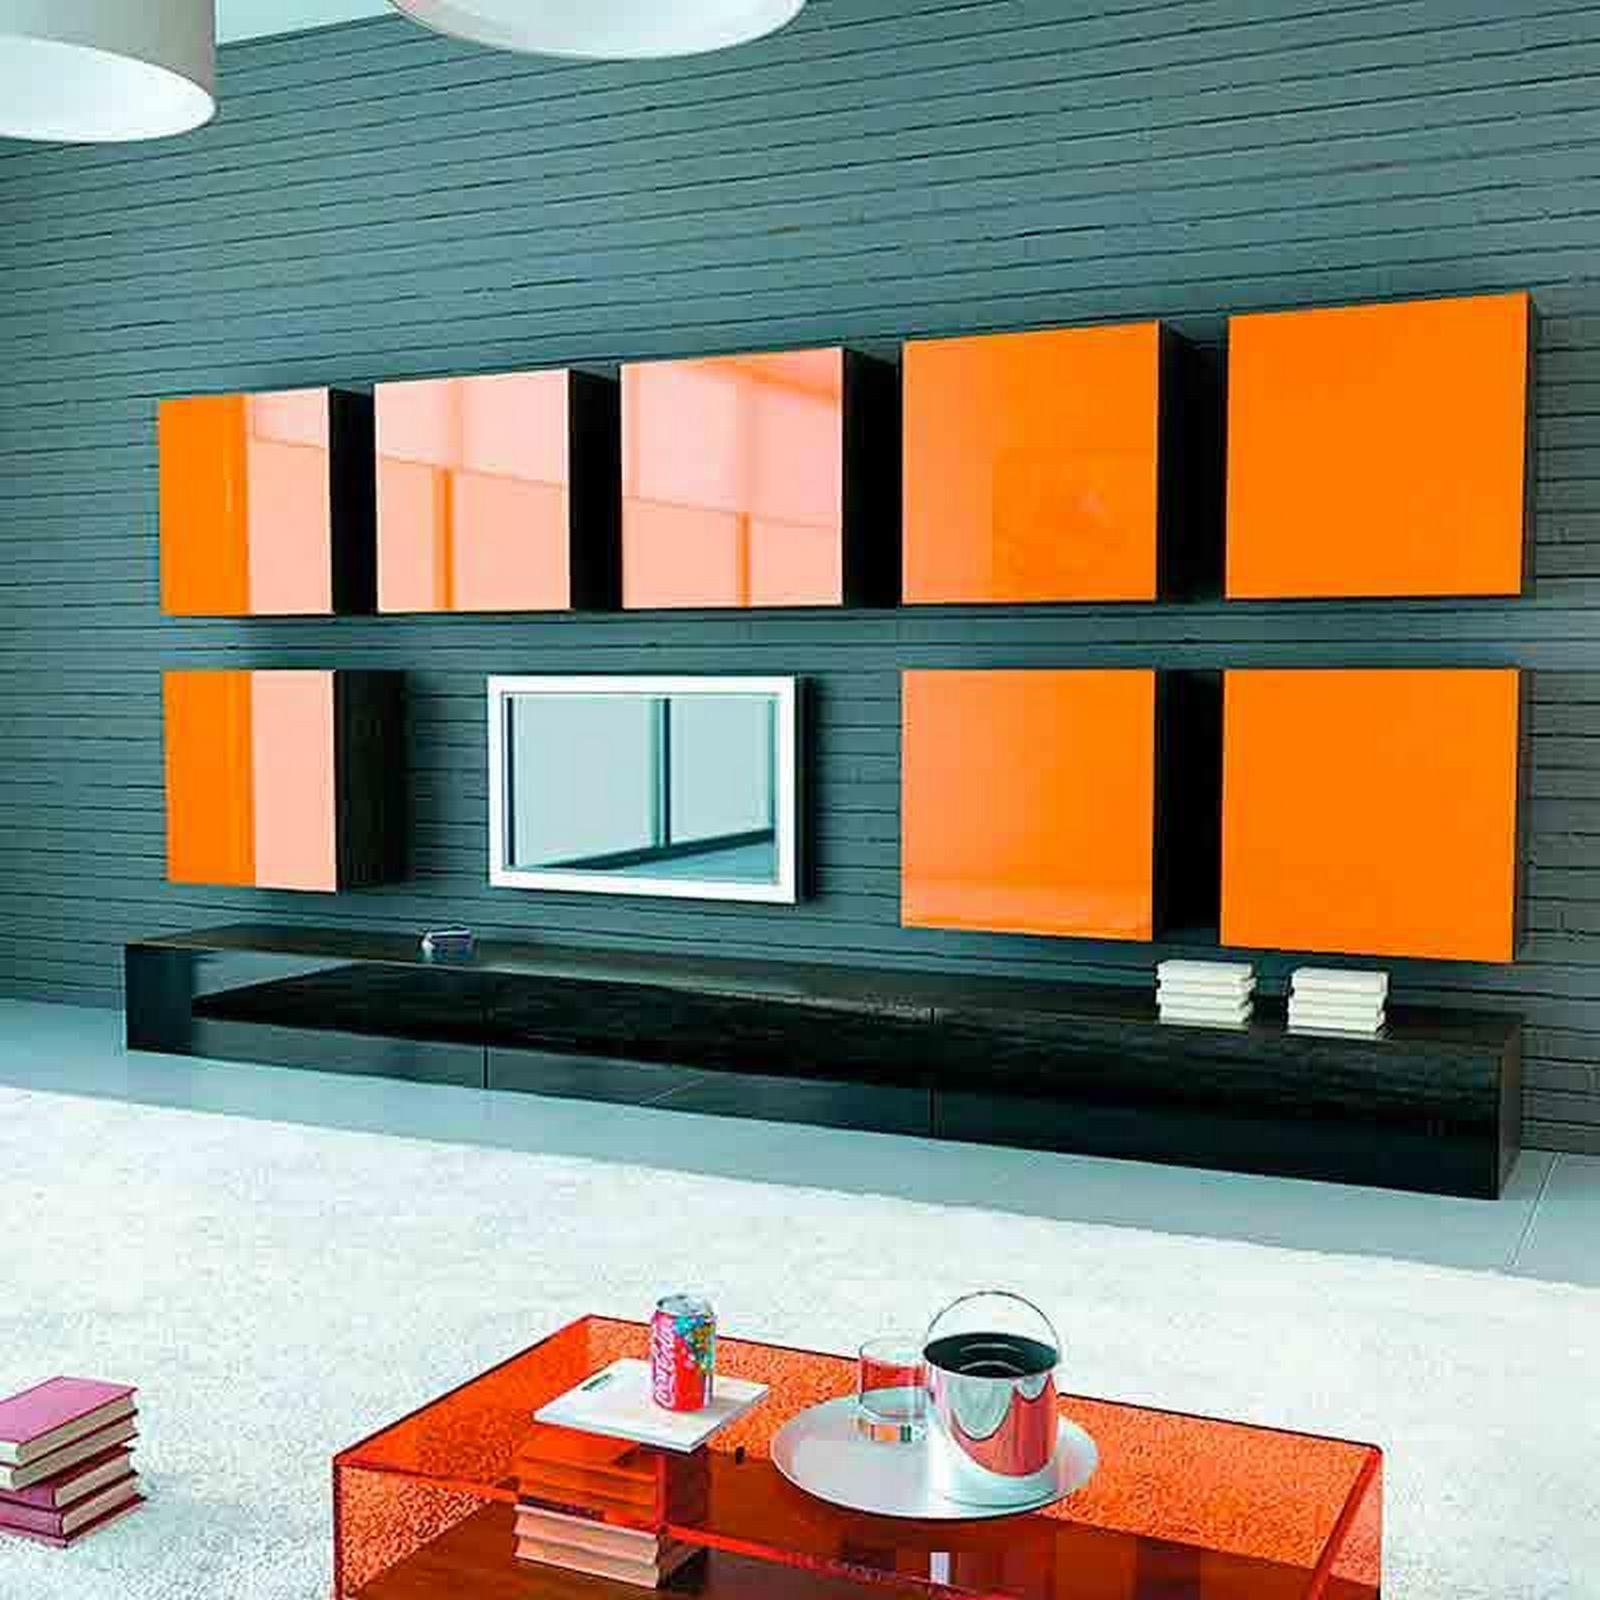 Кухонная мебель на заказ от производителя , фото. цена - дог.